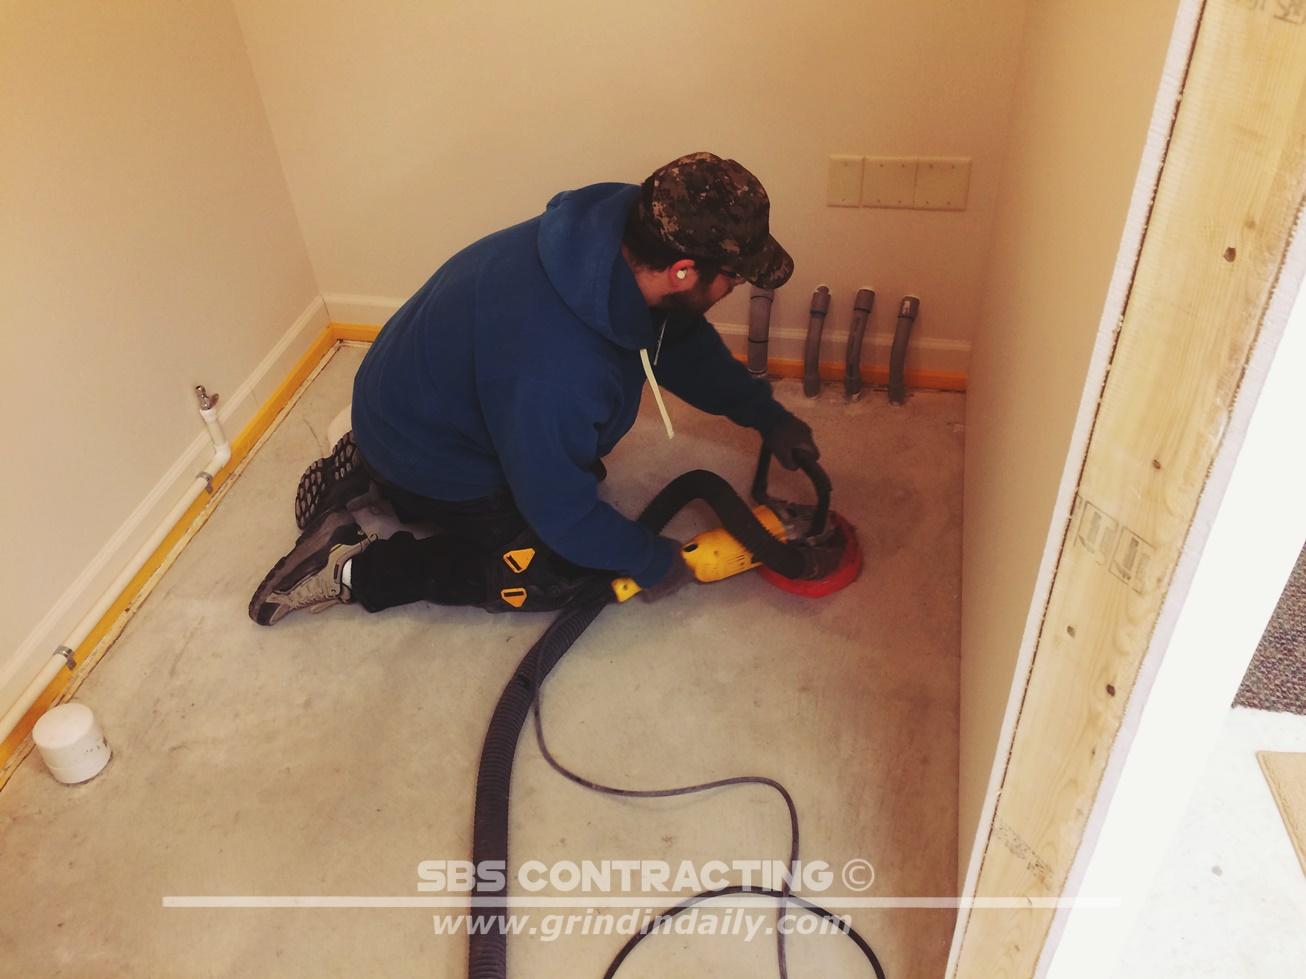 SBS-Contracting-Pole-Barn-Floor-Project-Before-01-2018-02